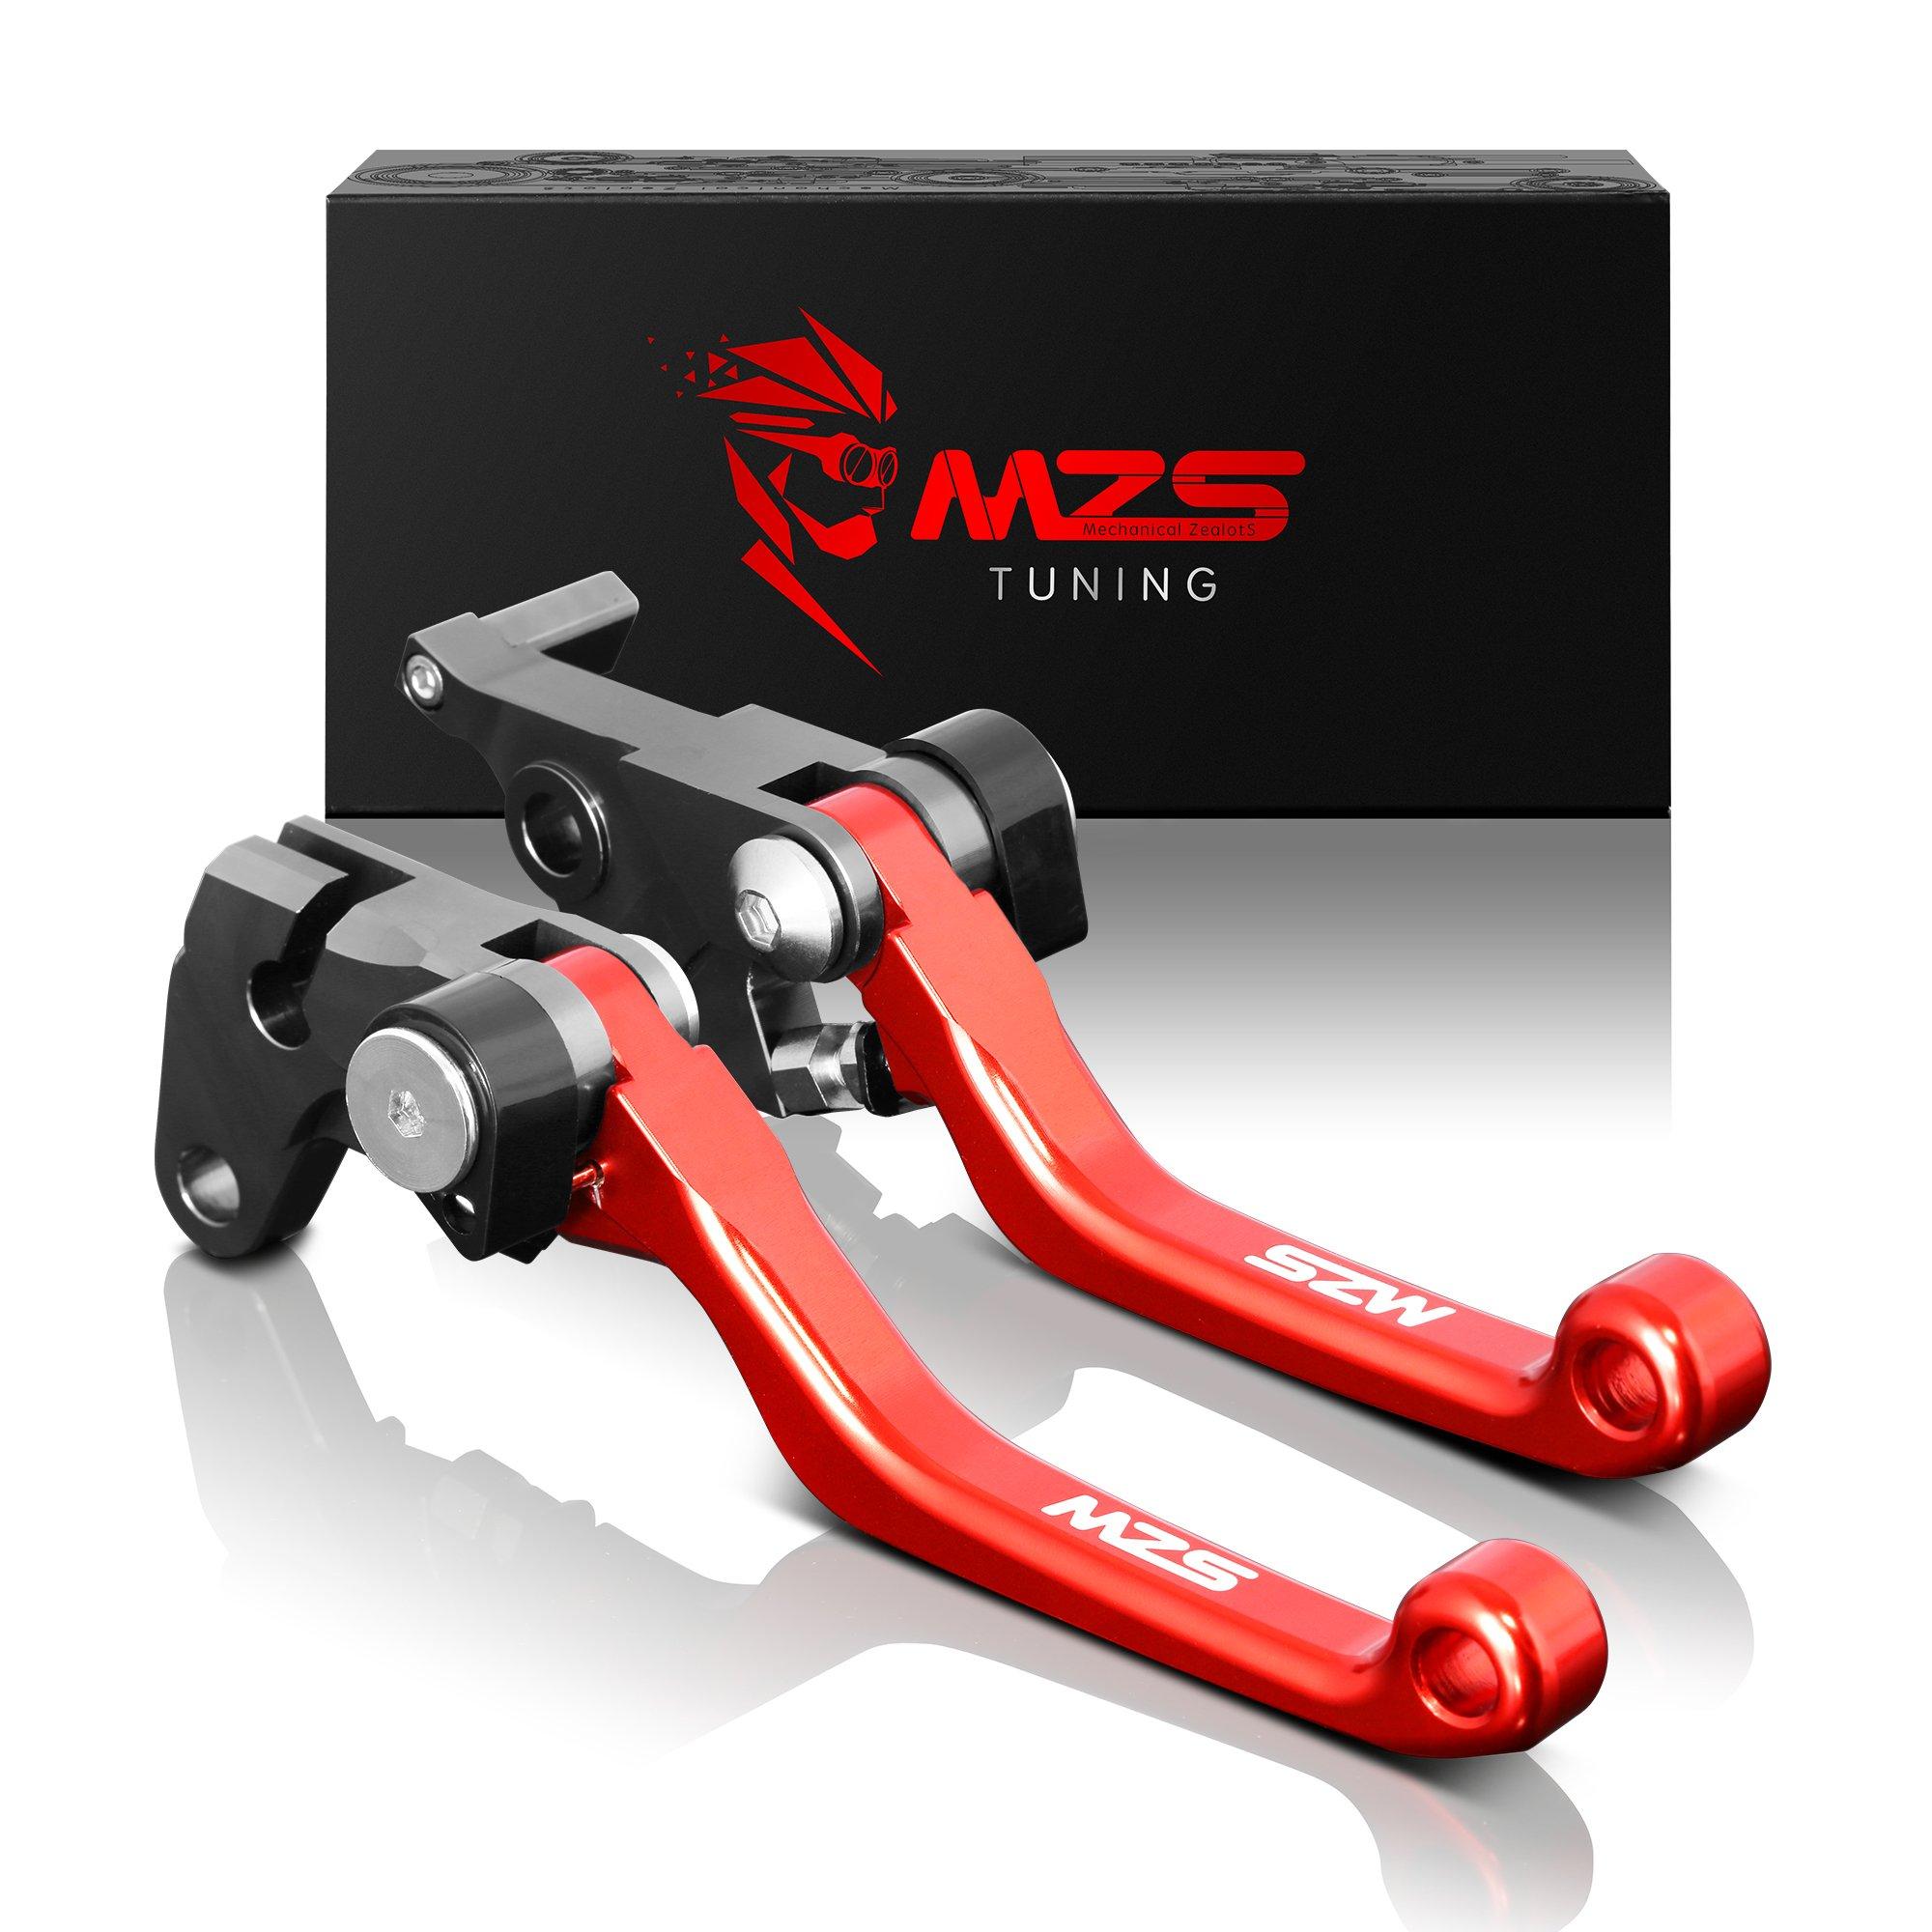 MZS Pivot Levers Brake Clutch Foldable CNC Red compatible Honda CR80R 98-07/ CR85R 98-07/ CR125R 92-03/ CR250R 92-03/ CRF125F 14-18/ CRF150R 07-18/ CRF450R 02-03/ CR500R 92-01/ XR650R 00-06 by MZS